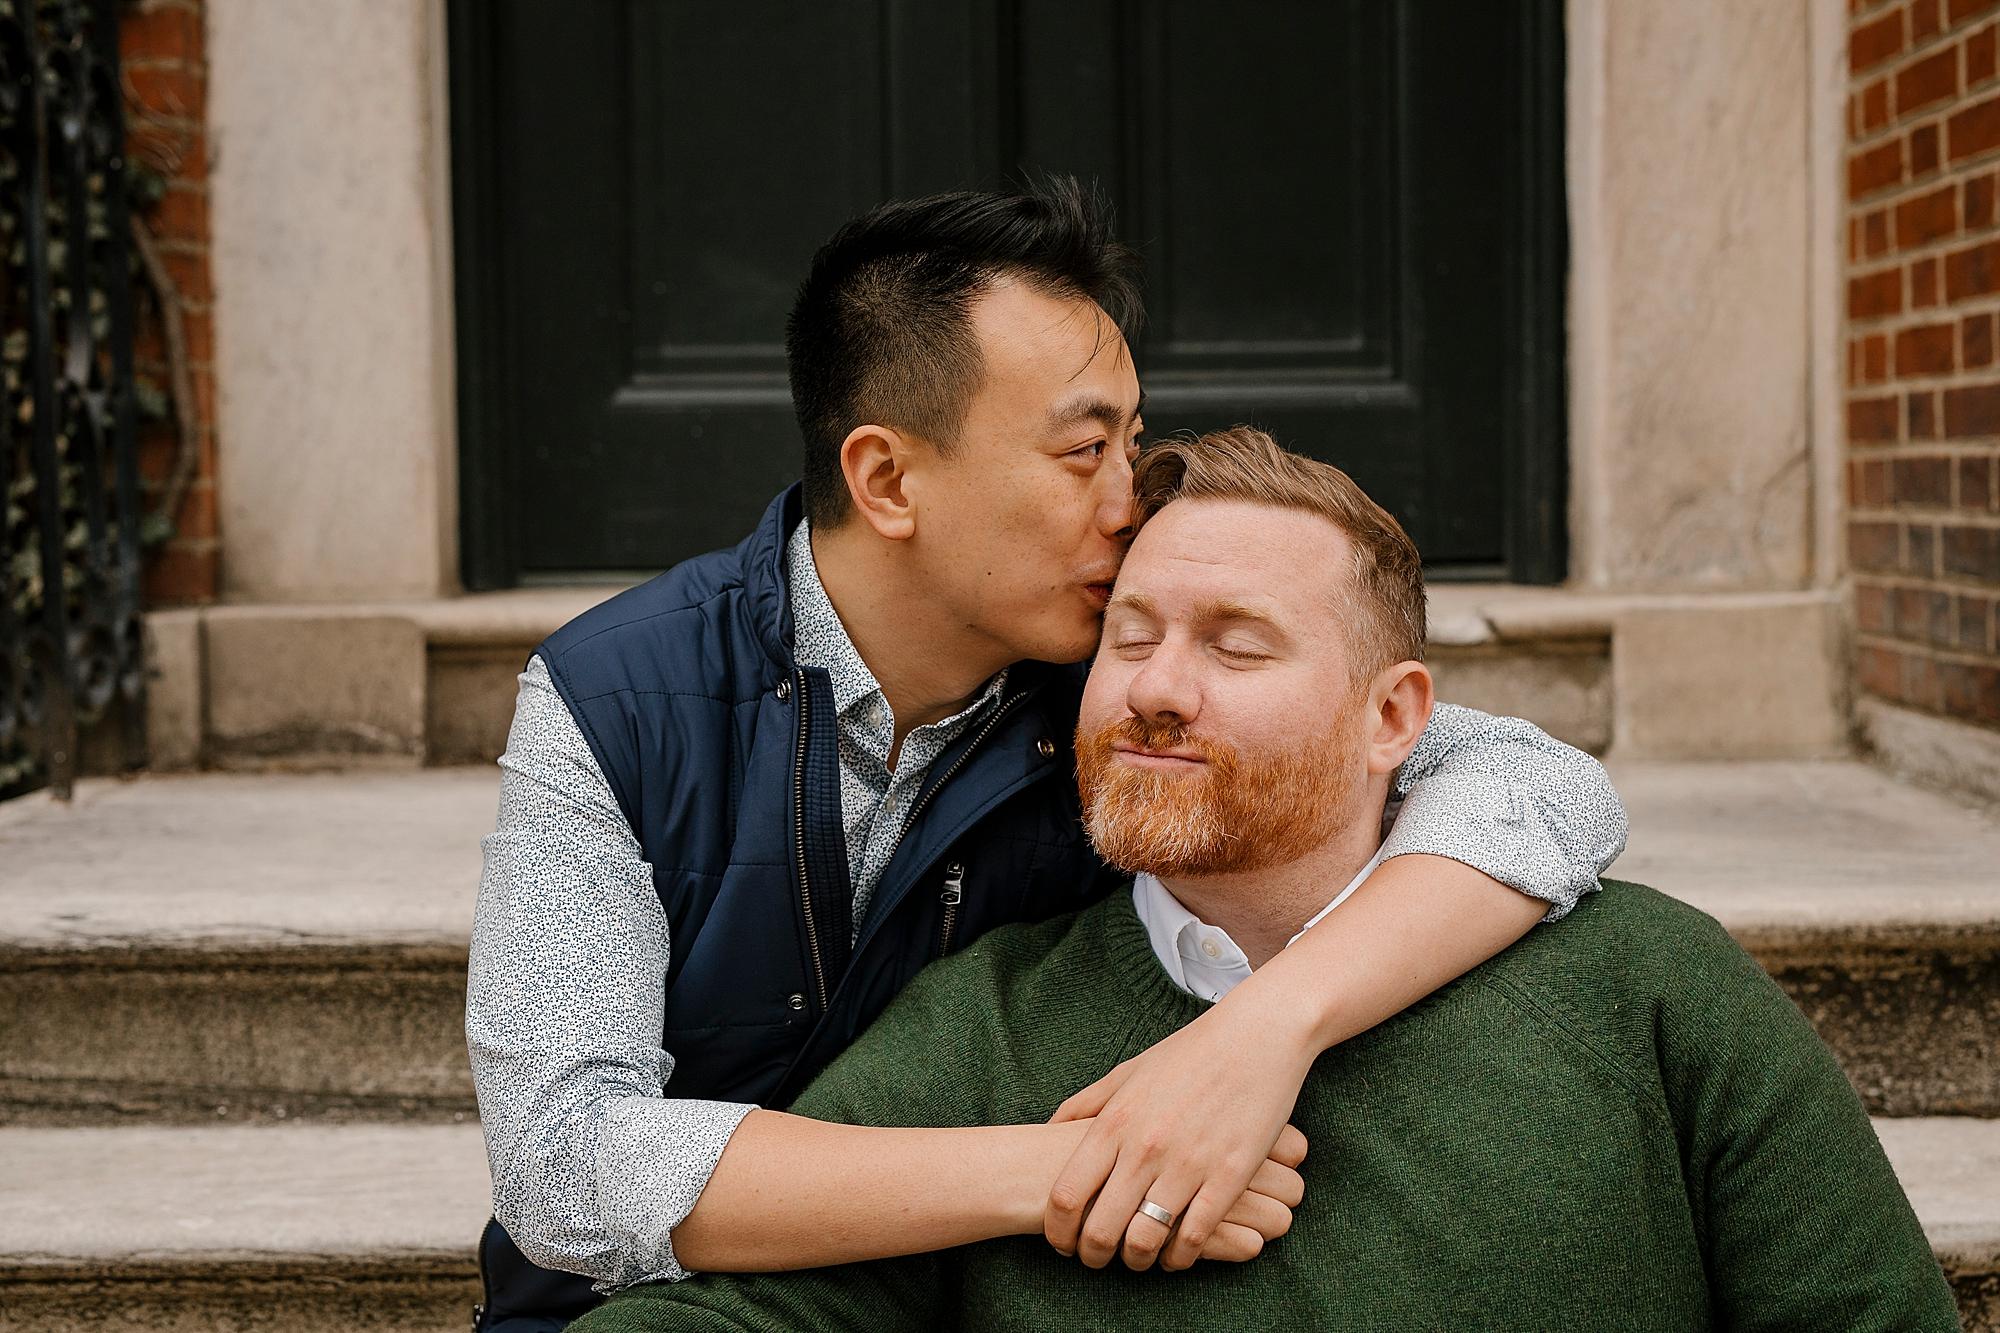 Love_BY_Joe_Mac_Creative_Philadelphia_Philly_Wedding_Photography_Gay_LGBT_Queer_Washington_Square_Park_Philadelphia__0020.jpg